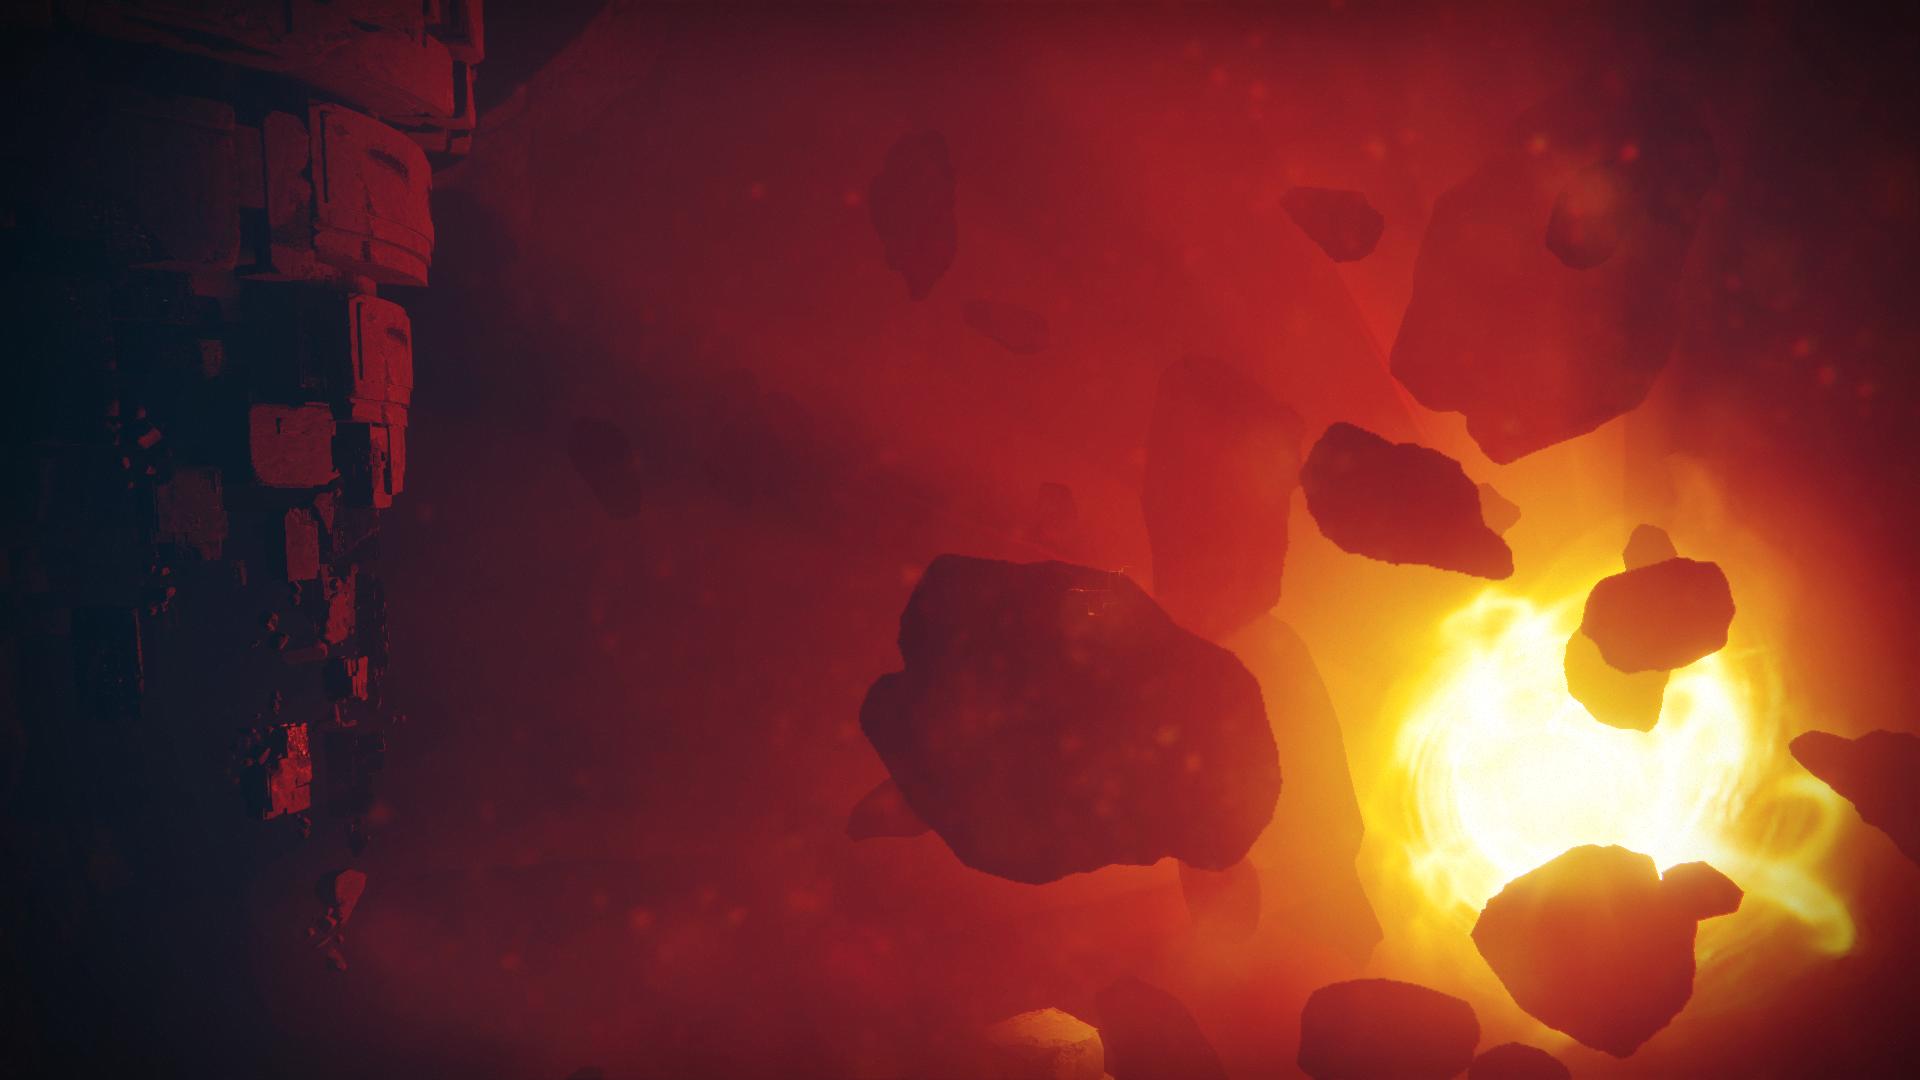 Destiny 2 Nessus Backgrounds 1920x1080